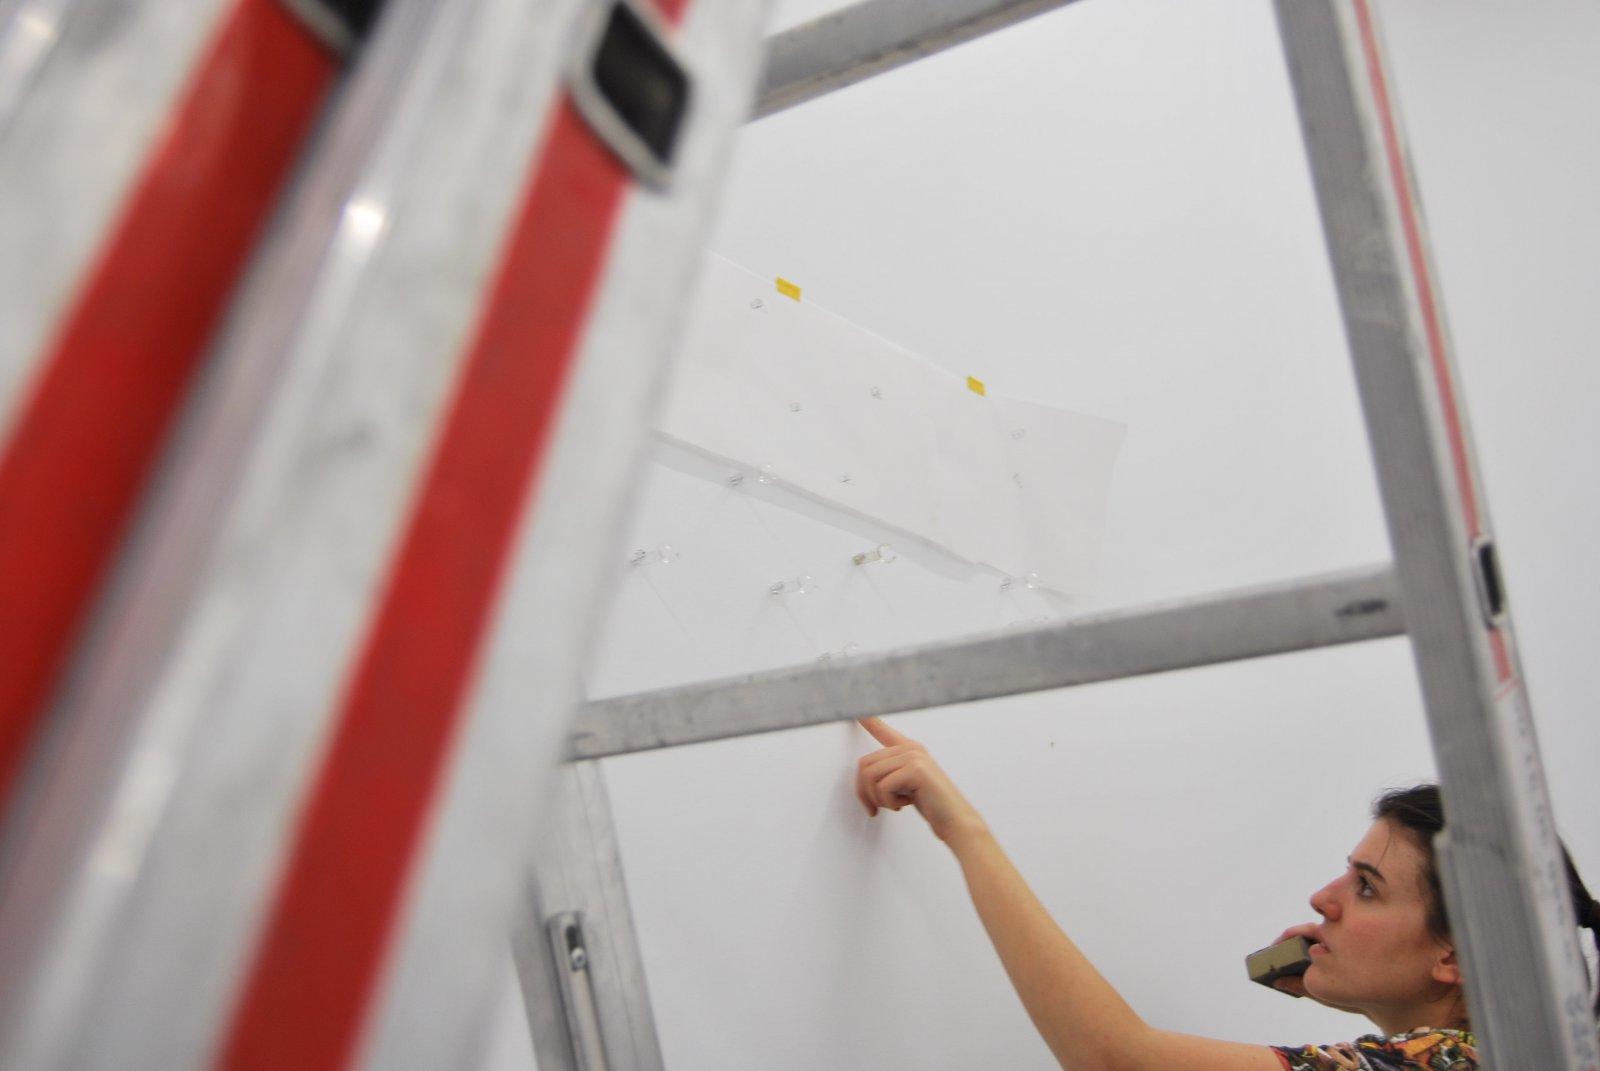 Montaje De \'Zorras\', De Garazi Lara Icaza, En La Galería Moisés Pérez De Albéniz